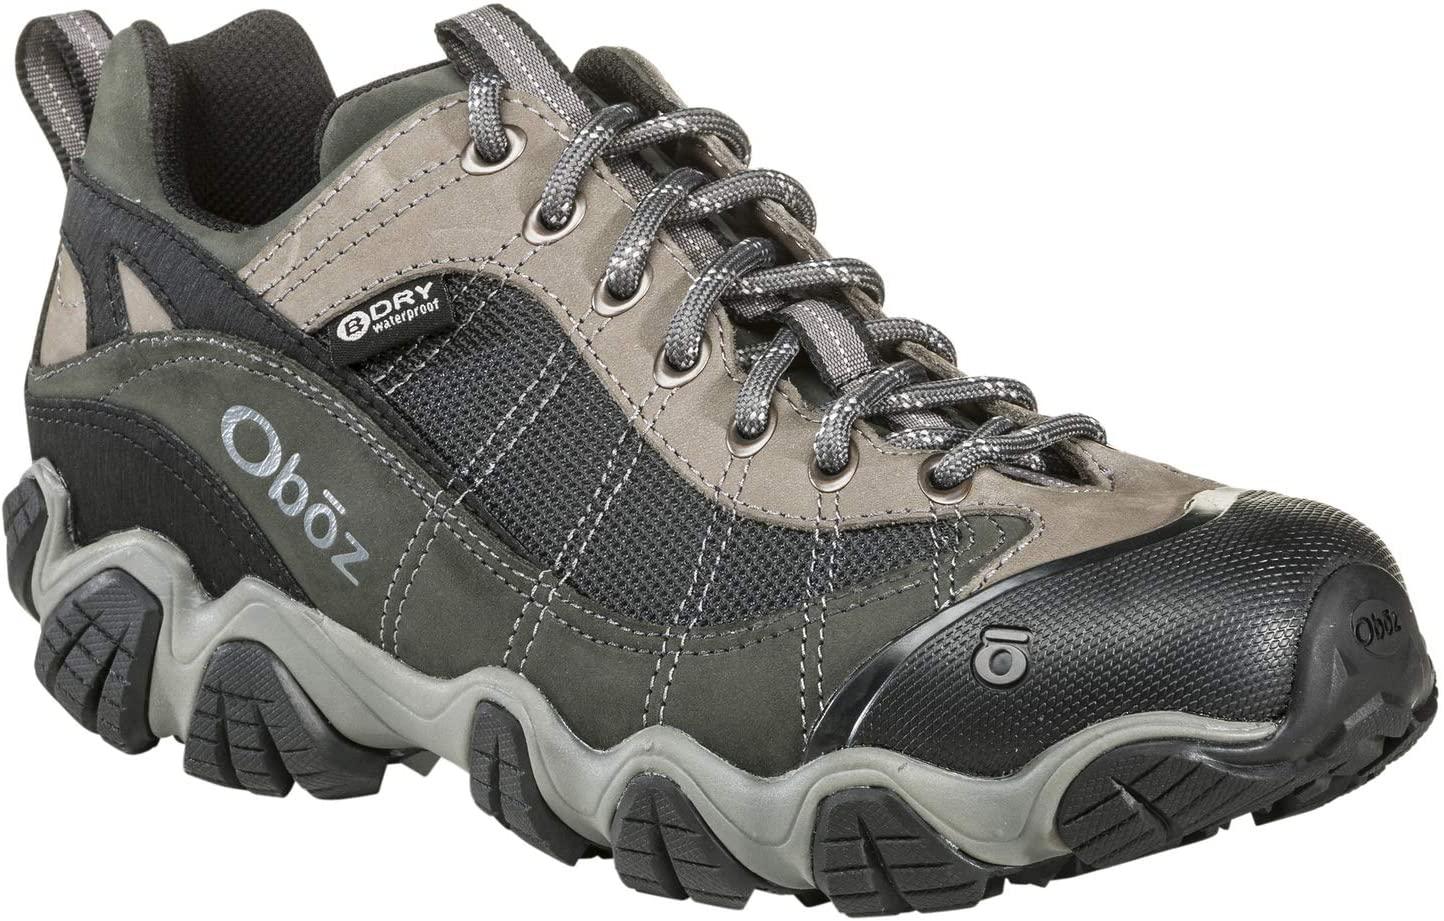 Oboz Firebrand II B-Dry Hiking Shoe - Mens Gray 14